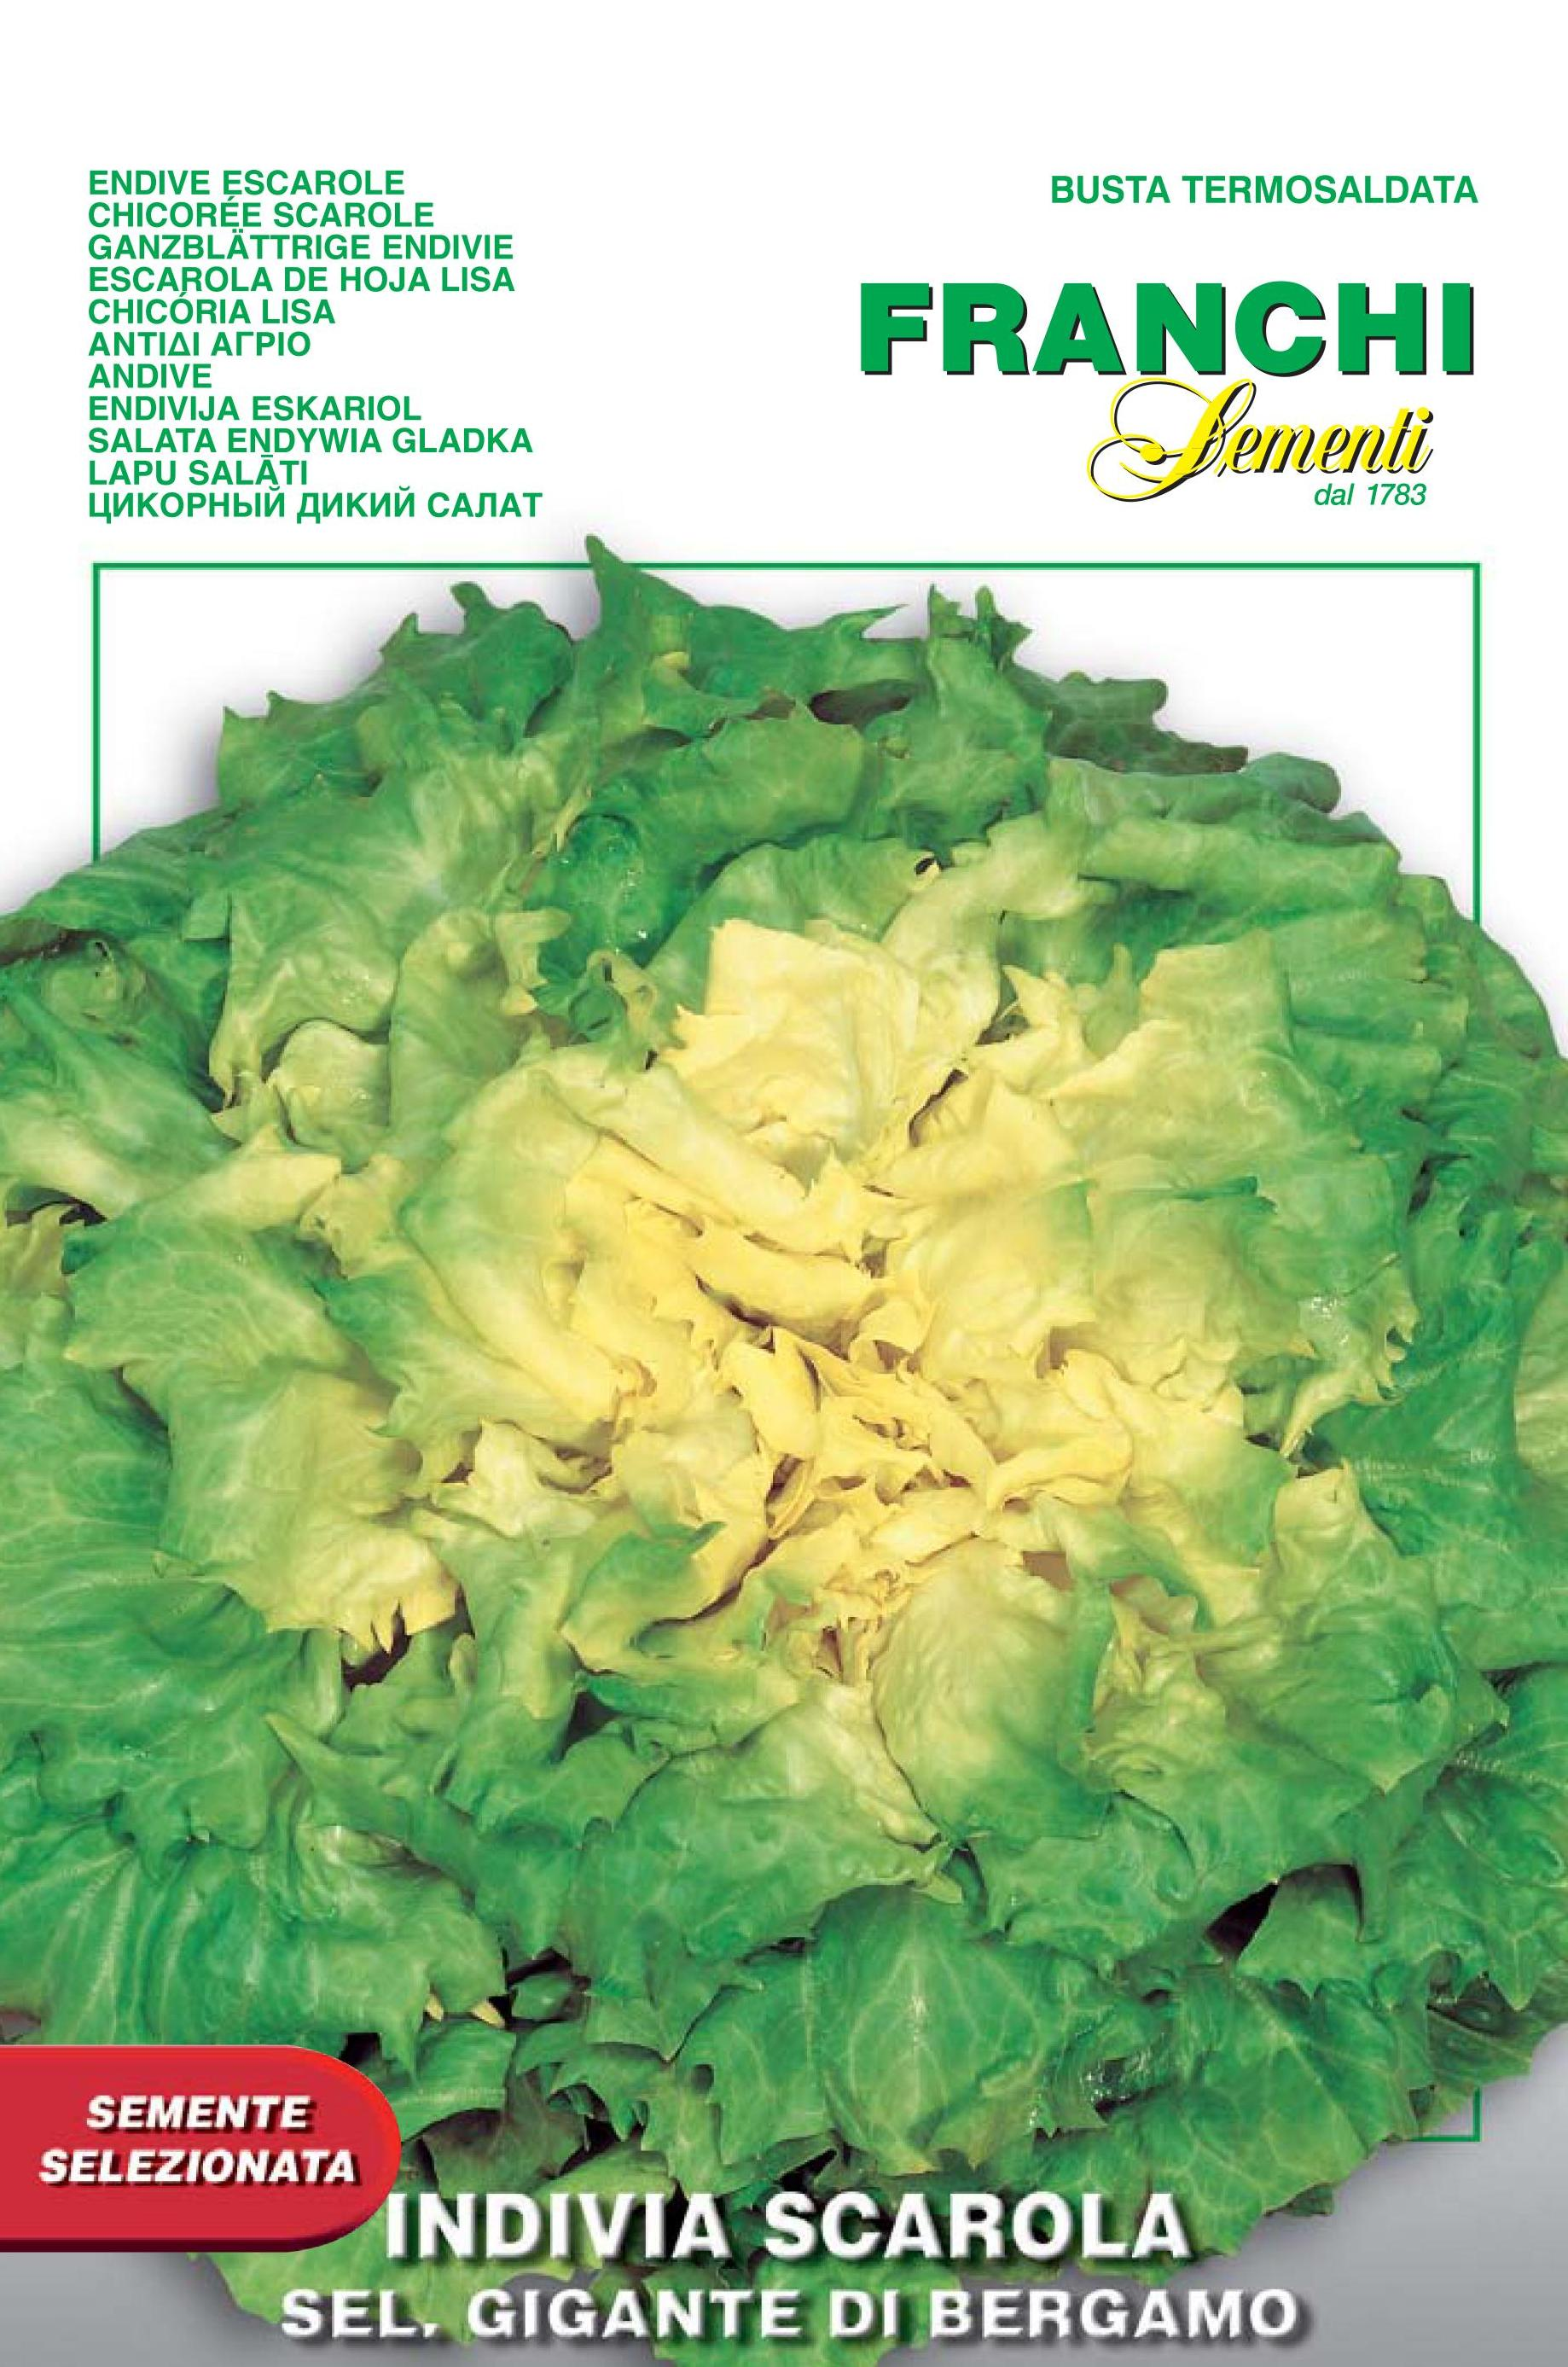 Endive Scarola Gigante Di Bergamo - Endangered variety*